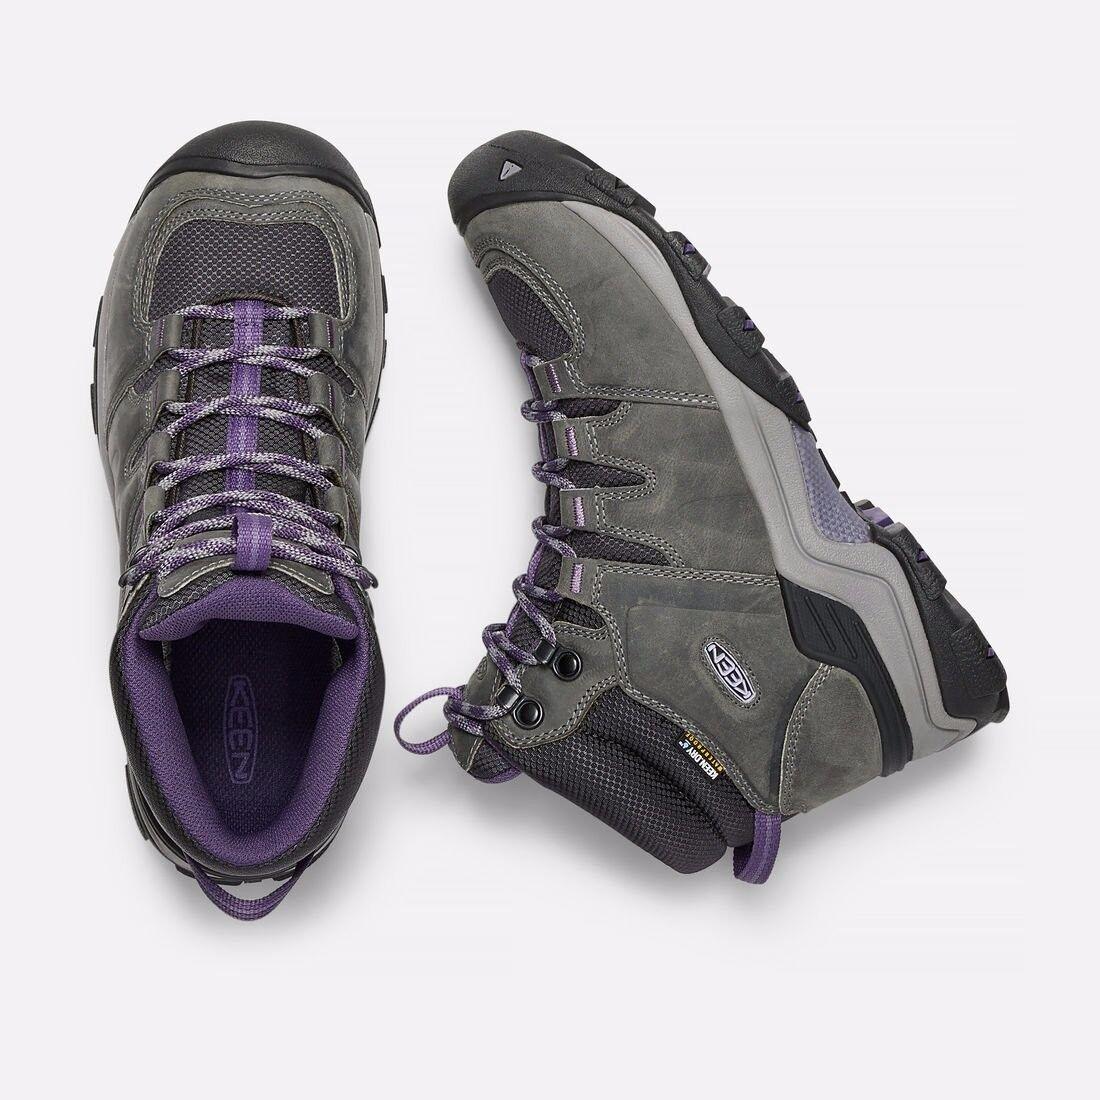 Keen Gypsum II Women's  Hiking Boot  wholesale prices